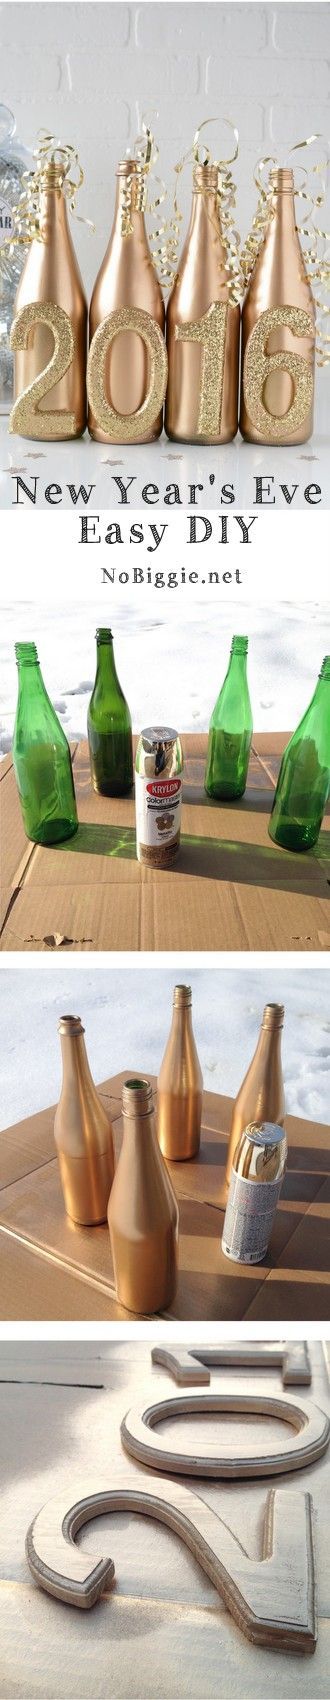 New Year's Eve DIY Decor